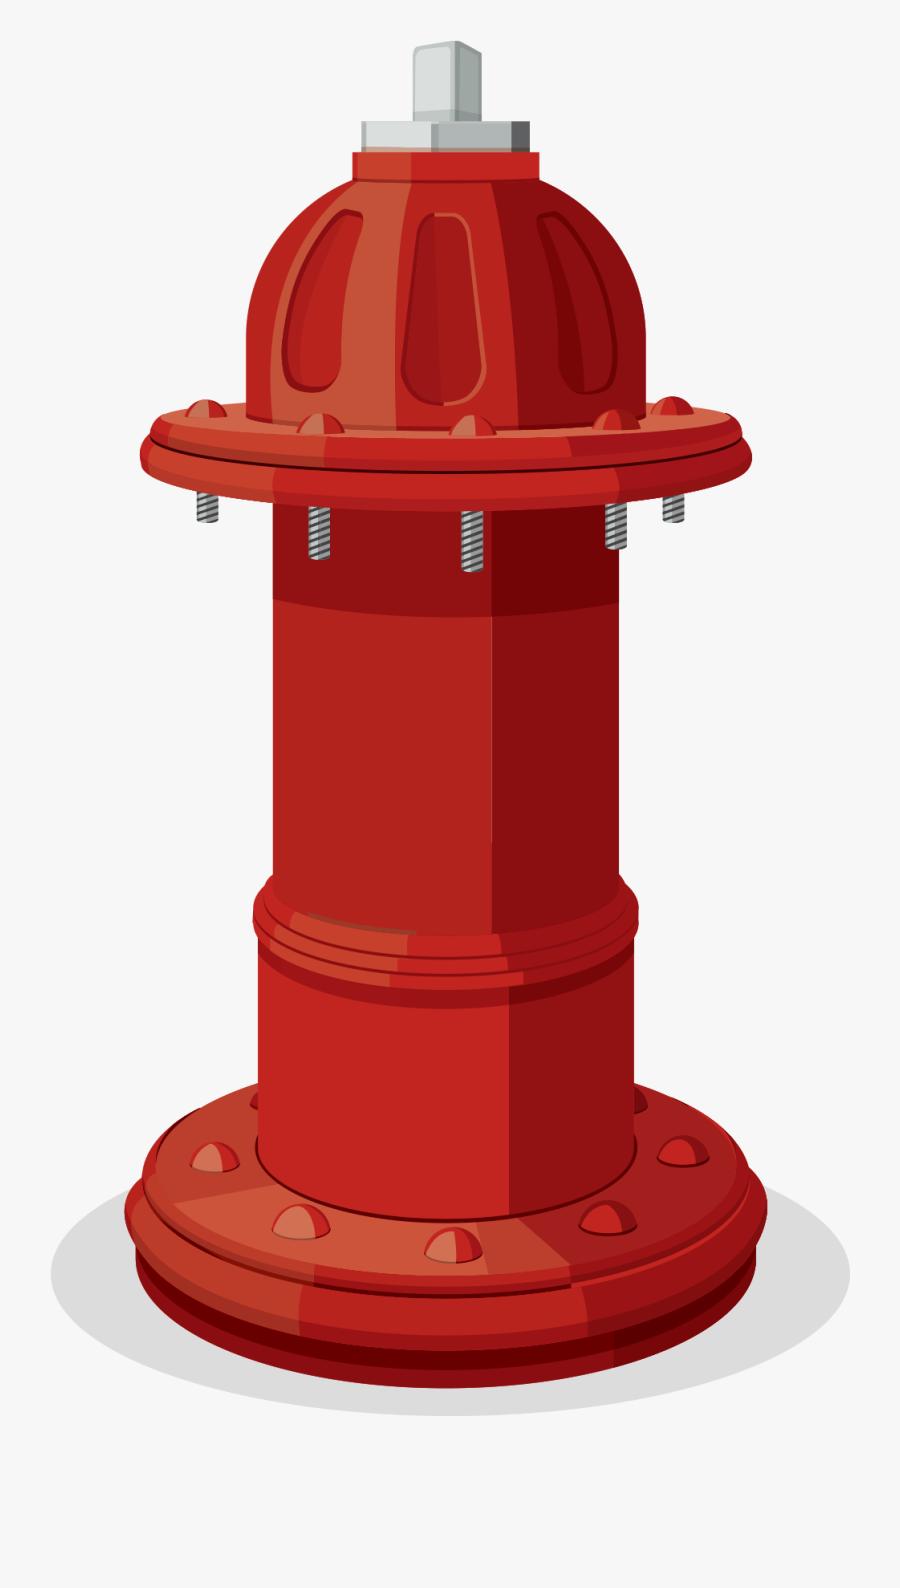 Hydrant Png, Transparent Clipart